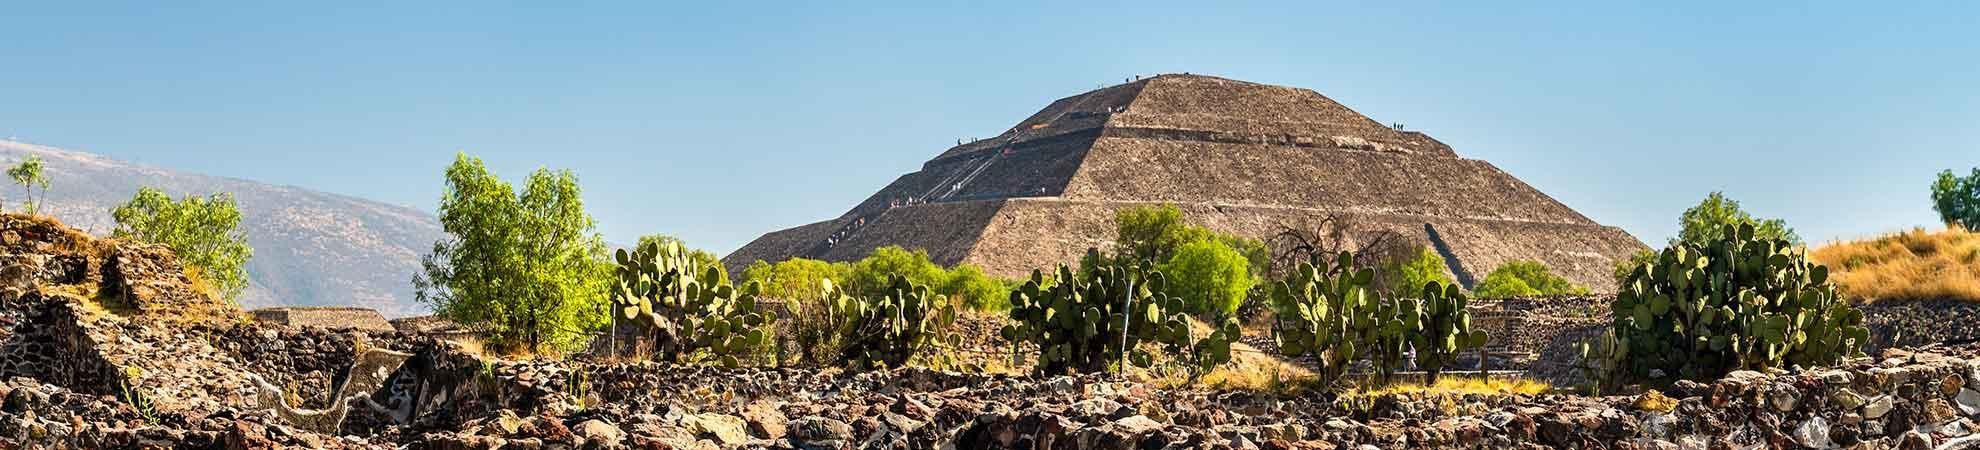 Voyage Teotihuacan